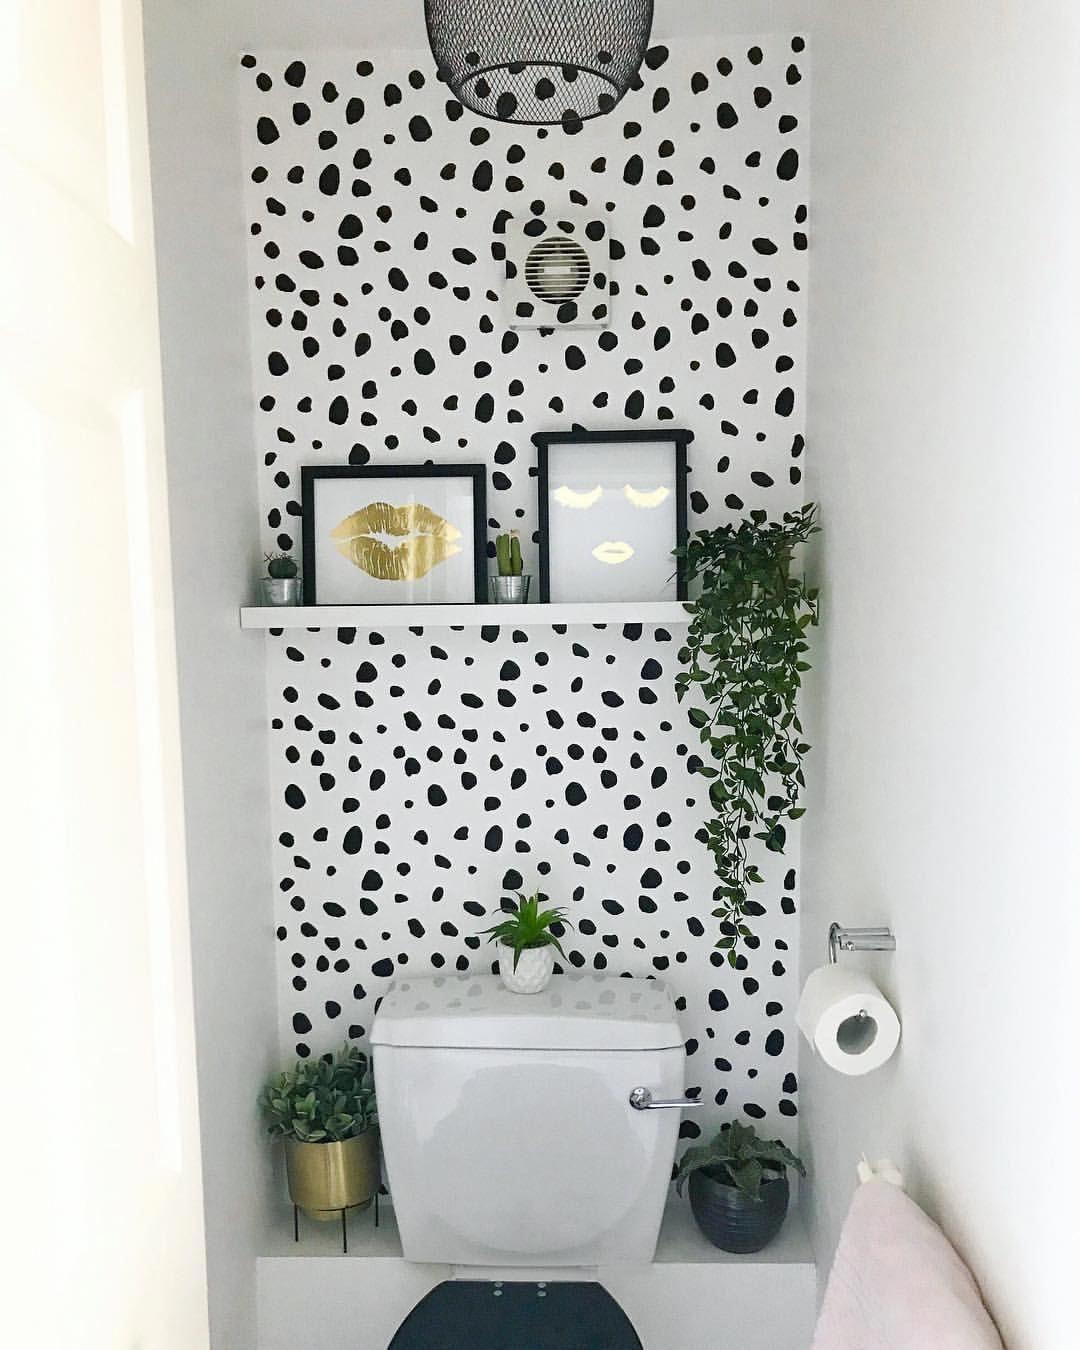 Fun Wallpaper For Half Bath Downstairsloo Fun Wallpaper For Half Bath Bathroomwallpaper Small Toilet Room Wc Ideas Downstairs Loo